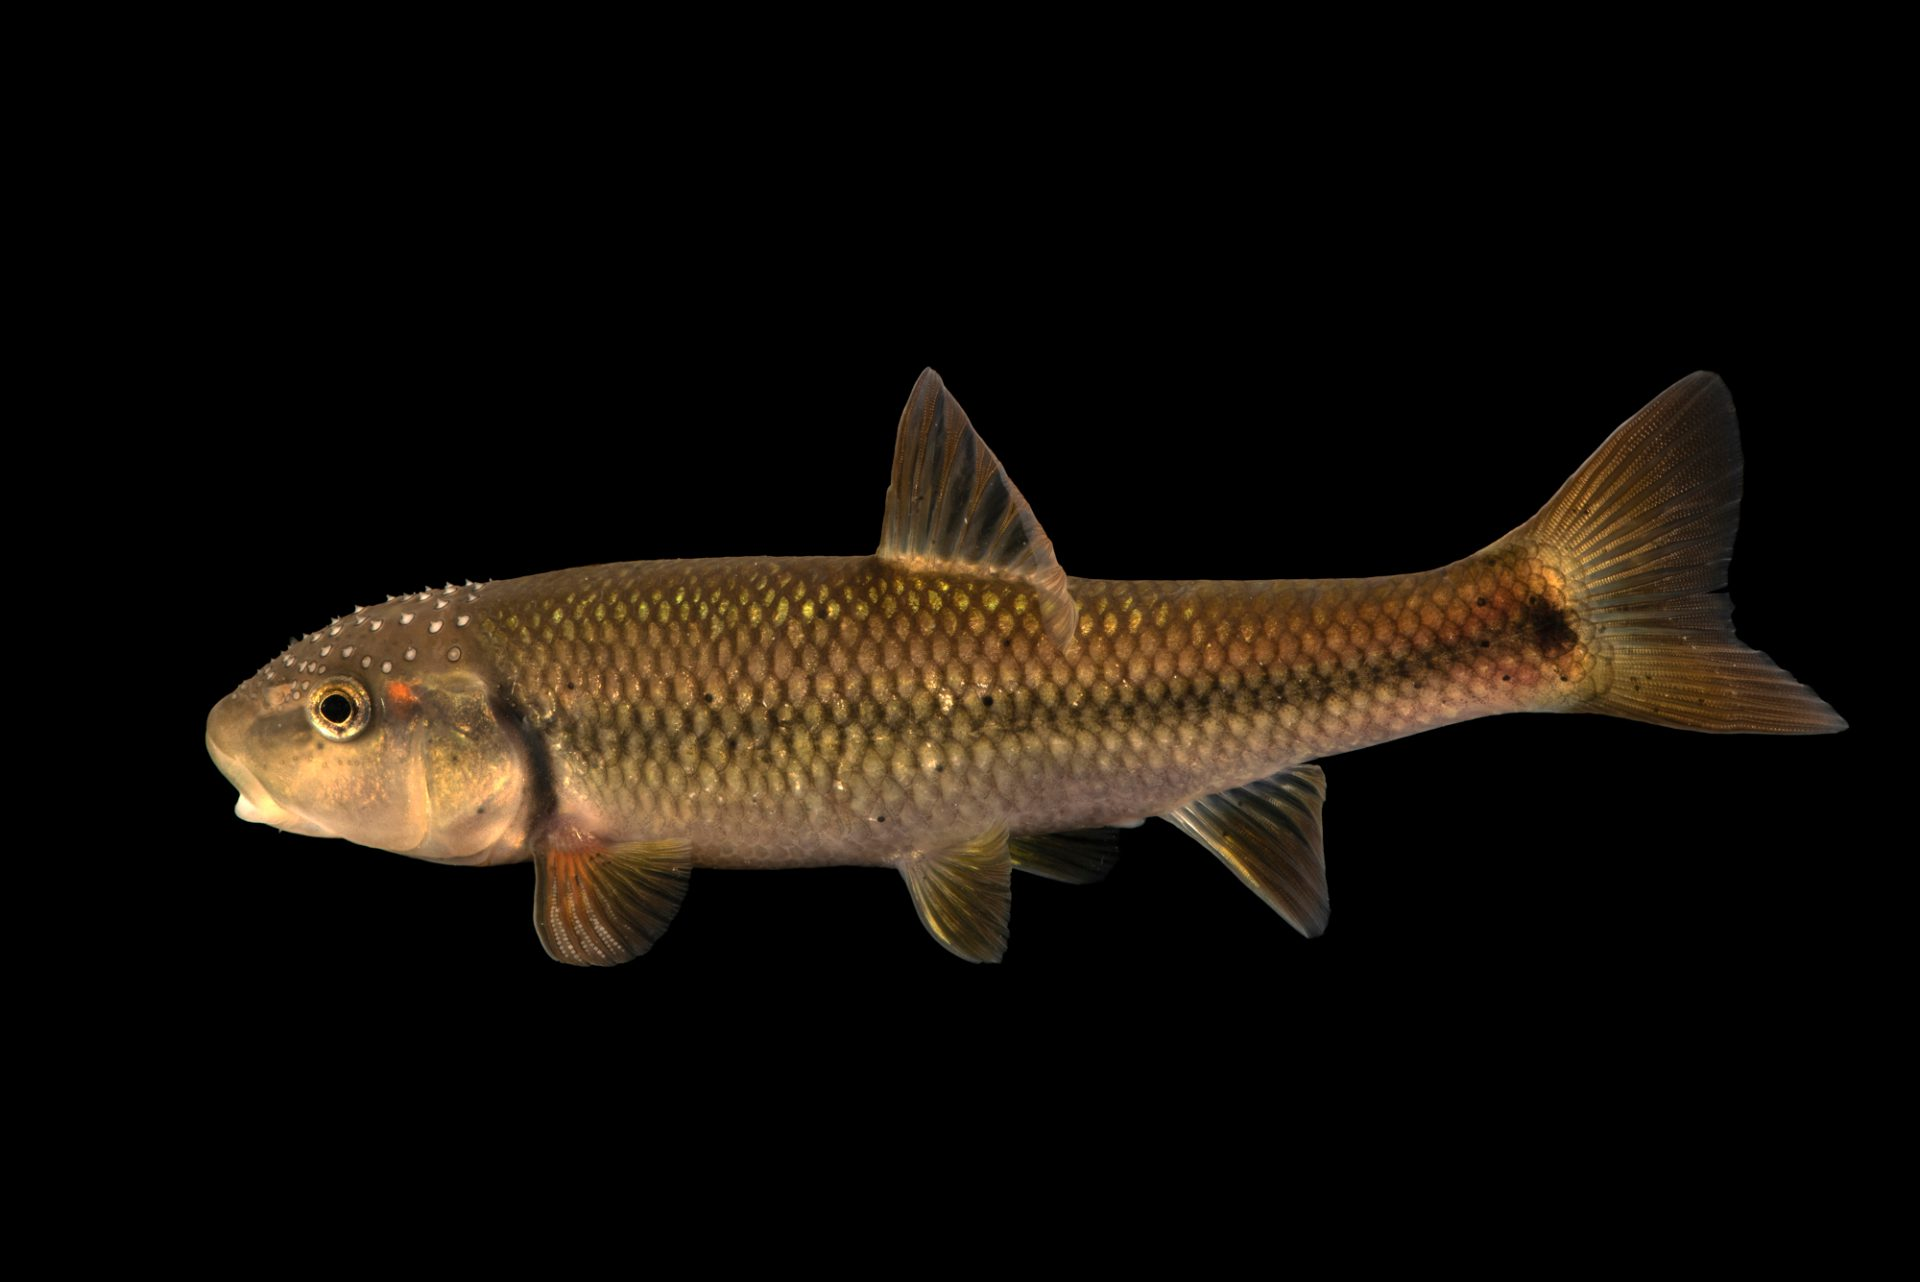 Photo: Hornyhead chub (Nocomis biguttatus) at the Minnesota Dept. of Natural Resources Center for Aquatic Mollusk Programs.